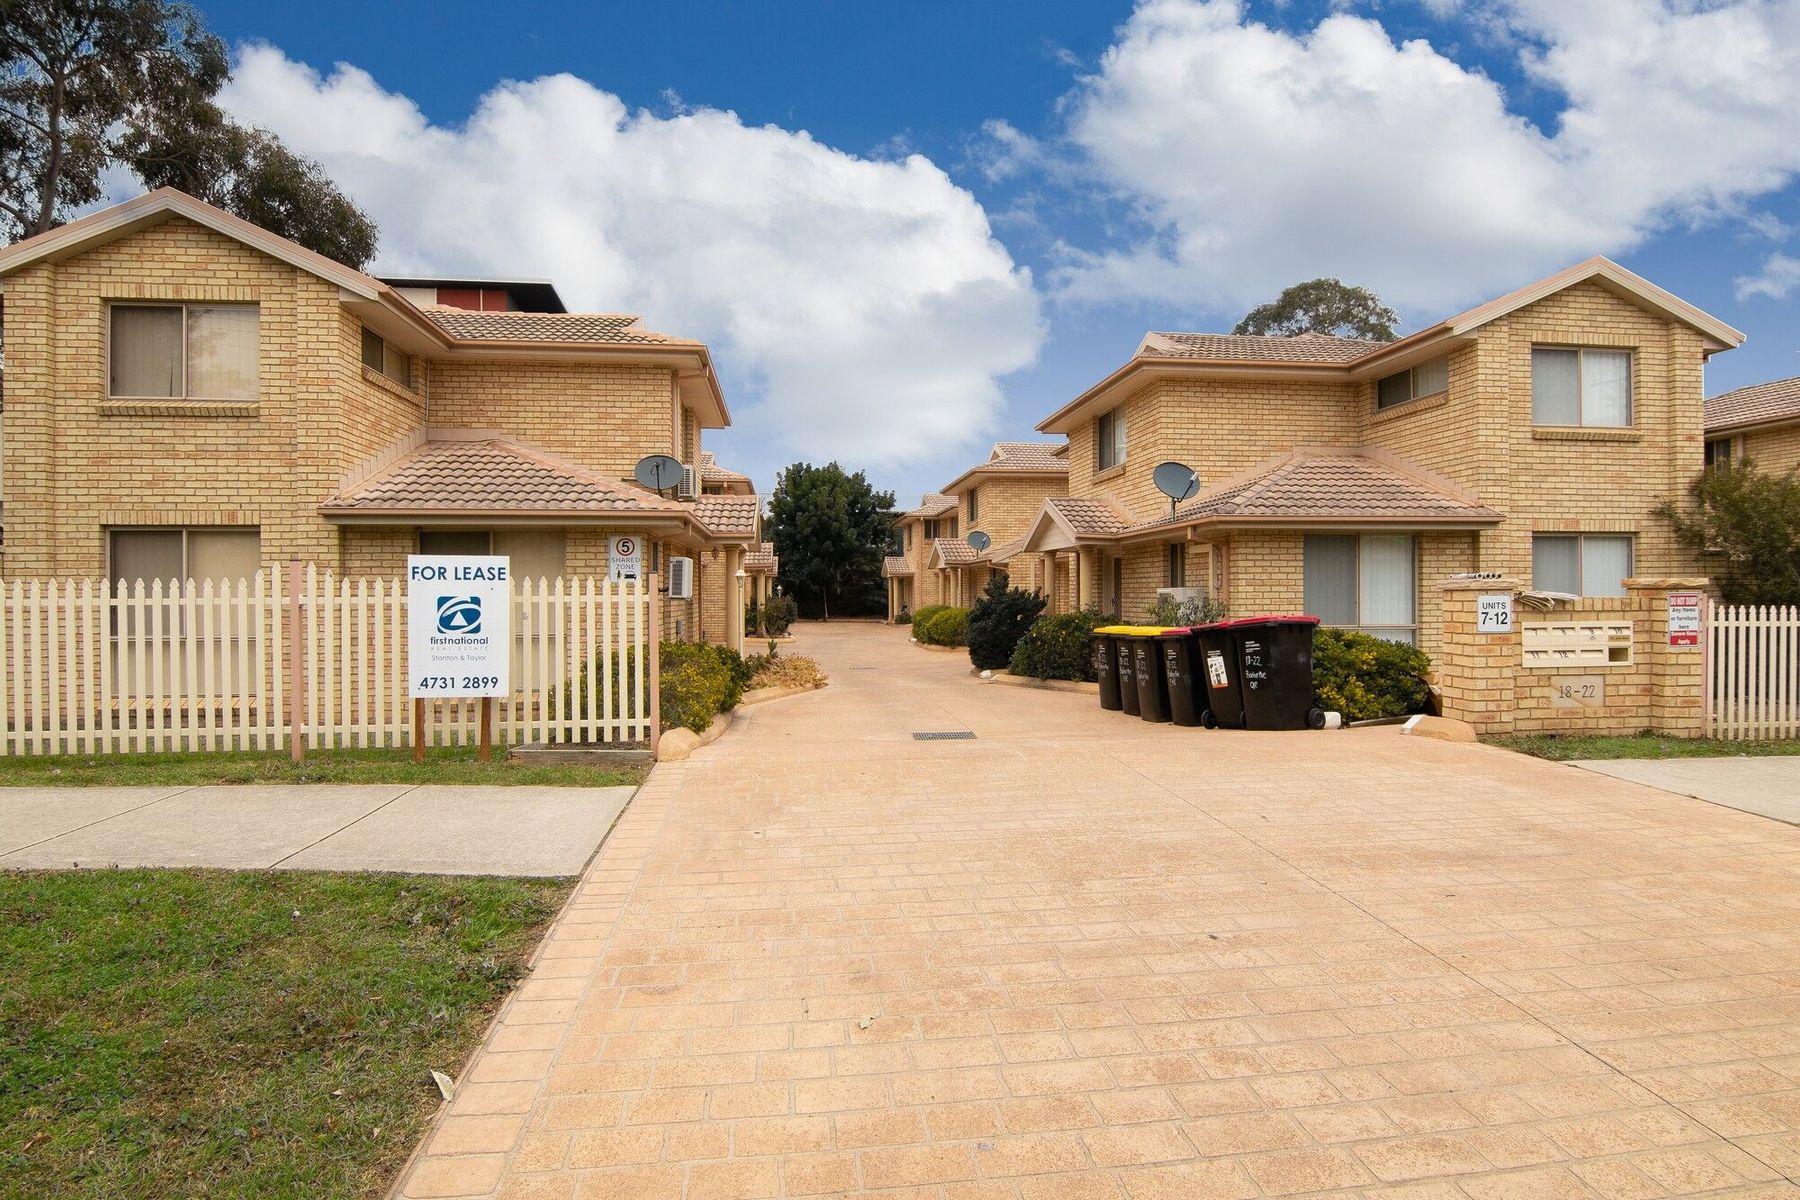 2/18-22 Barber Avenue, Penrith, NSW 2750